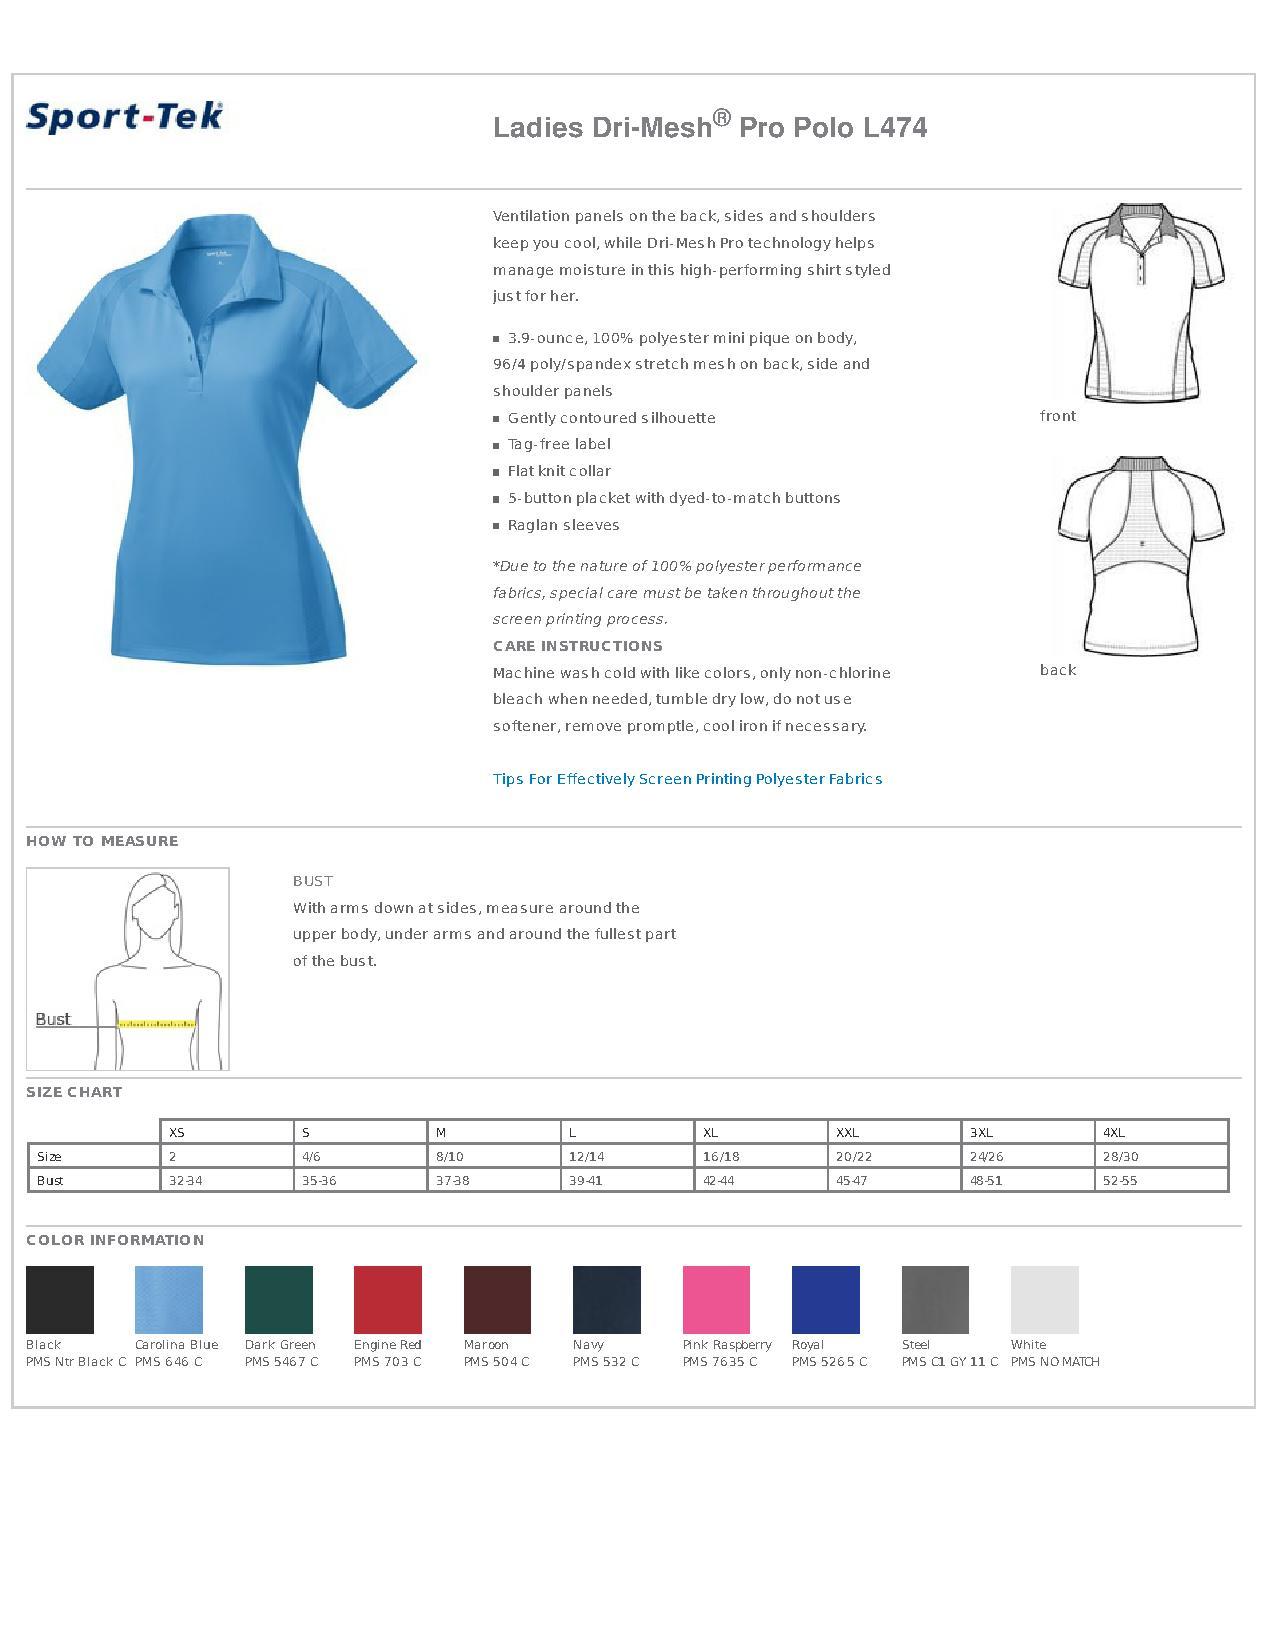 Sport-Tek® L474 Ladies Dri-Mesh® Pro Polo - Women's Sport Shirts